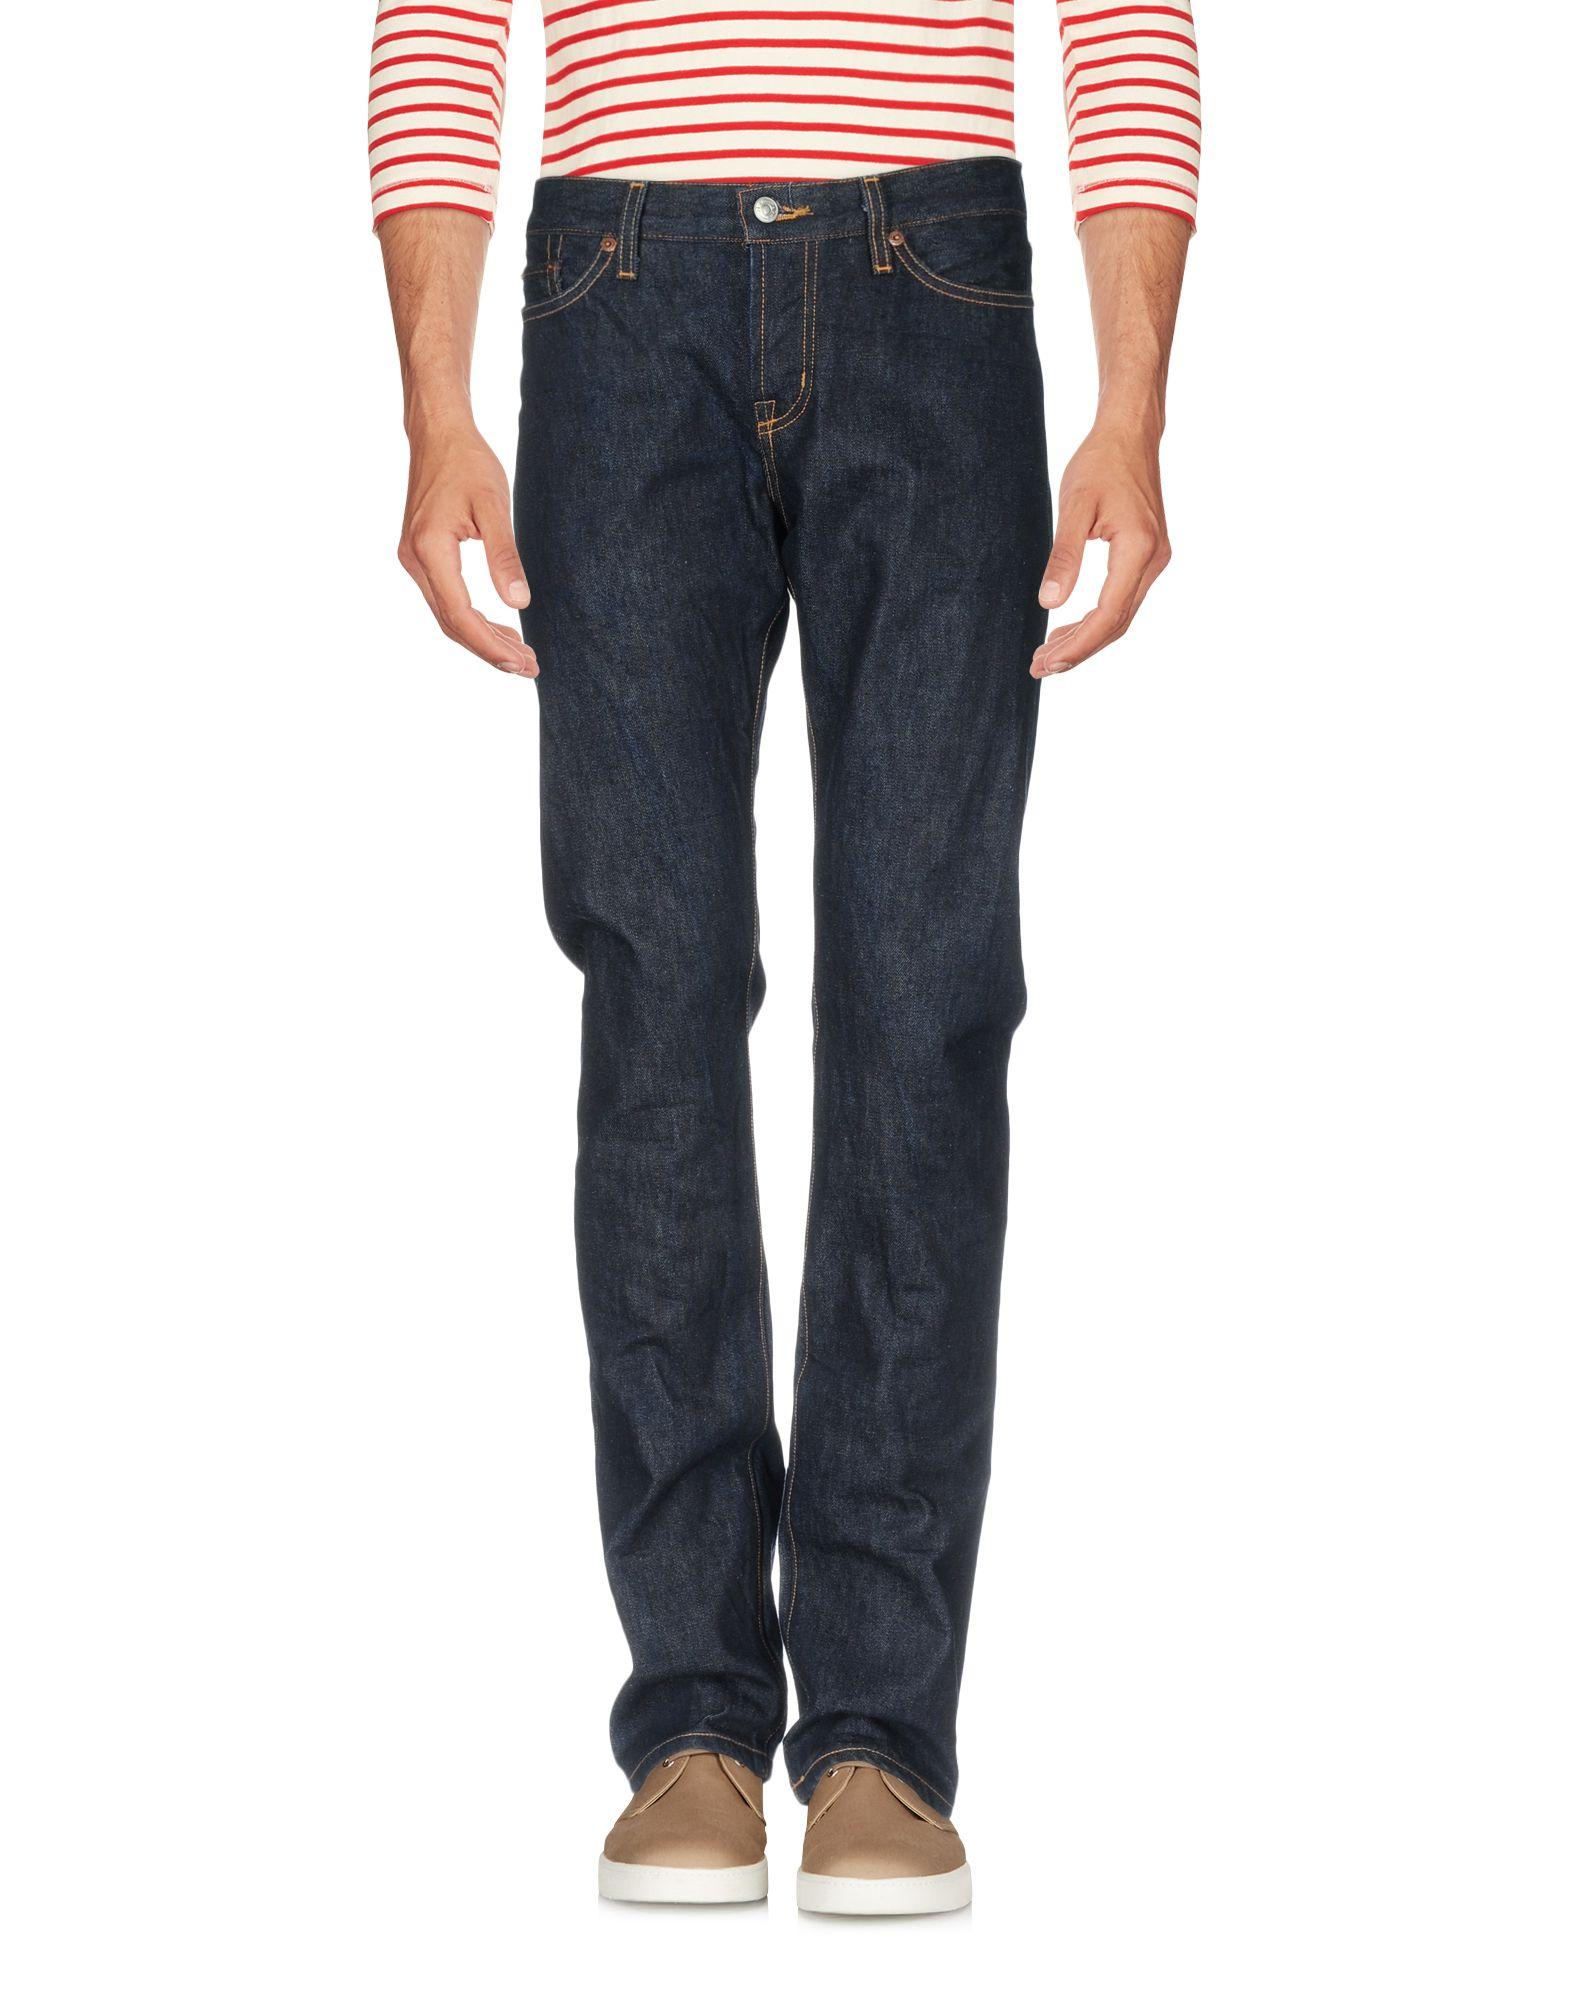 Фото - JEAN SHOP Джинсовые брюки jean paul gaultier le male